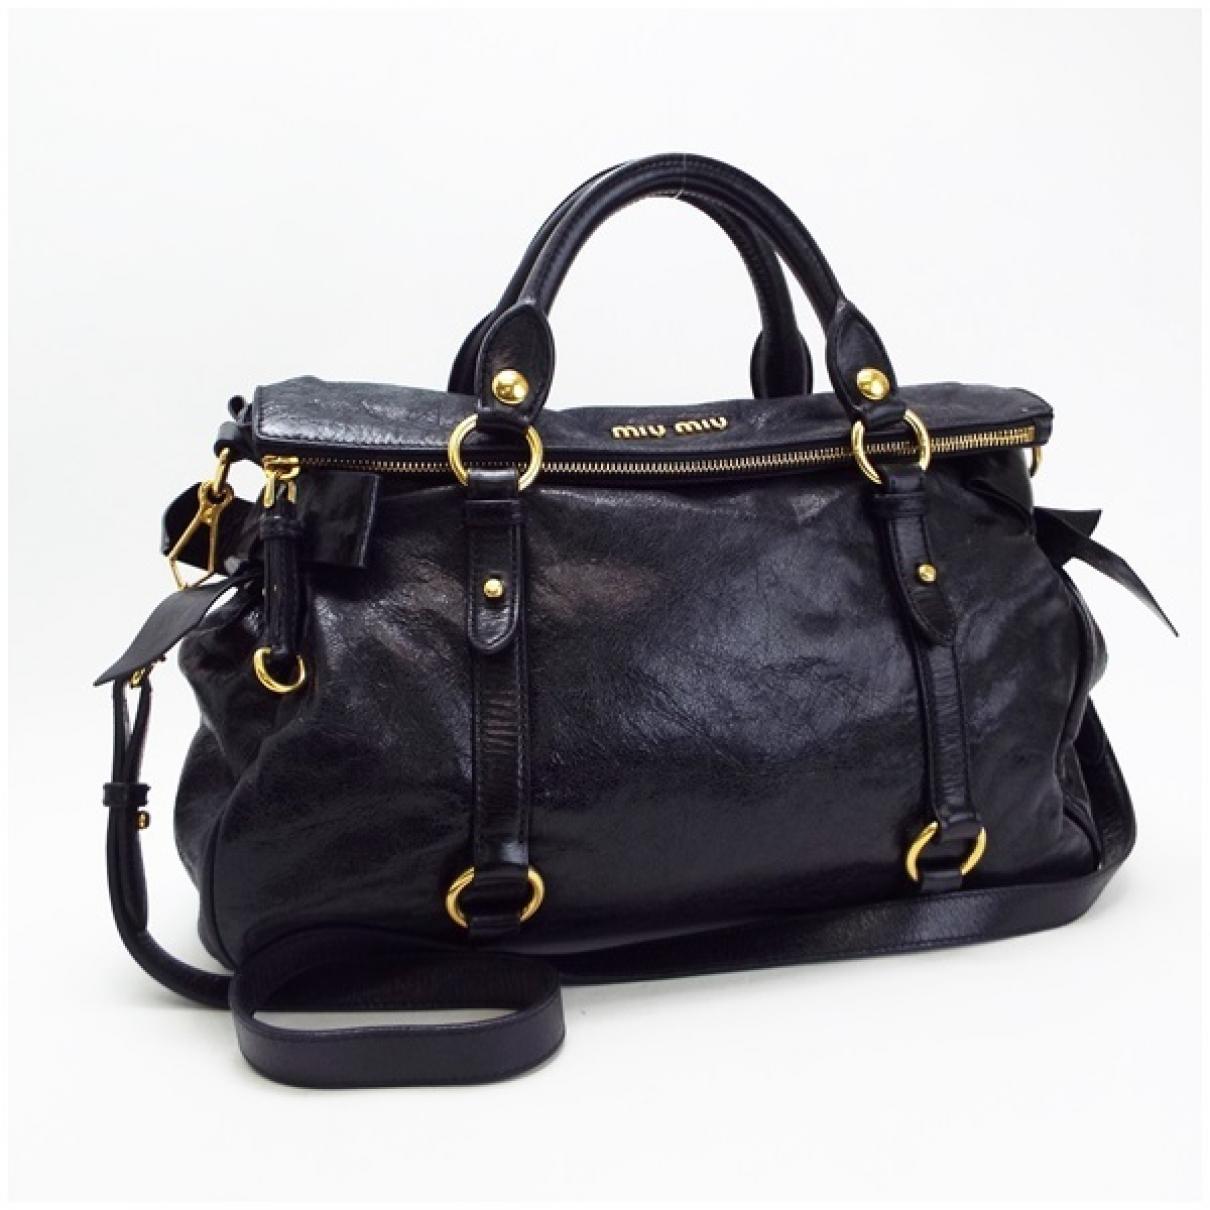 Miu Miu Bow bag Black Leather handbag for Women \N